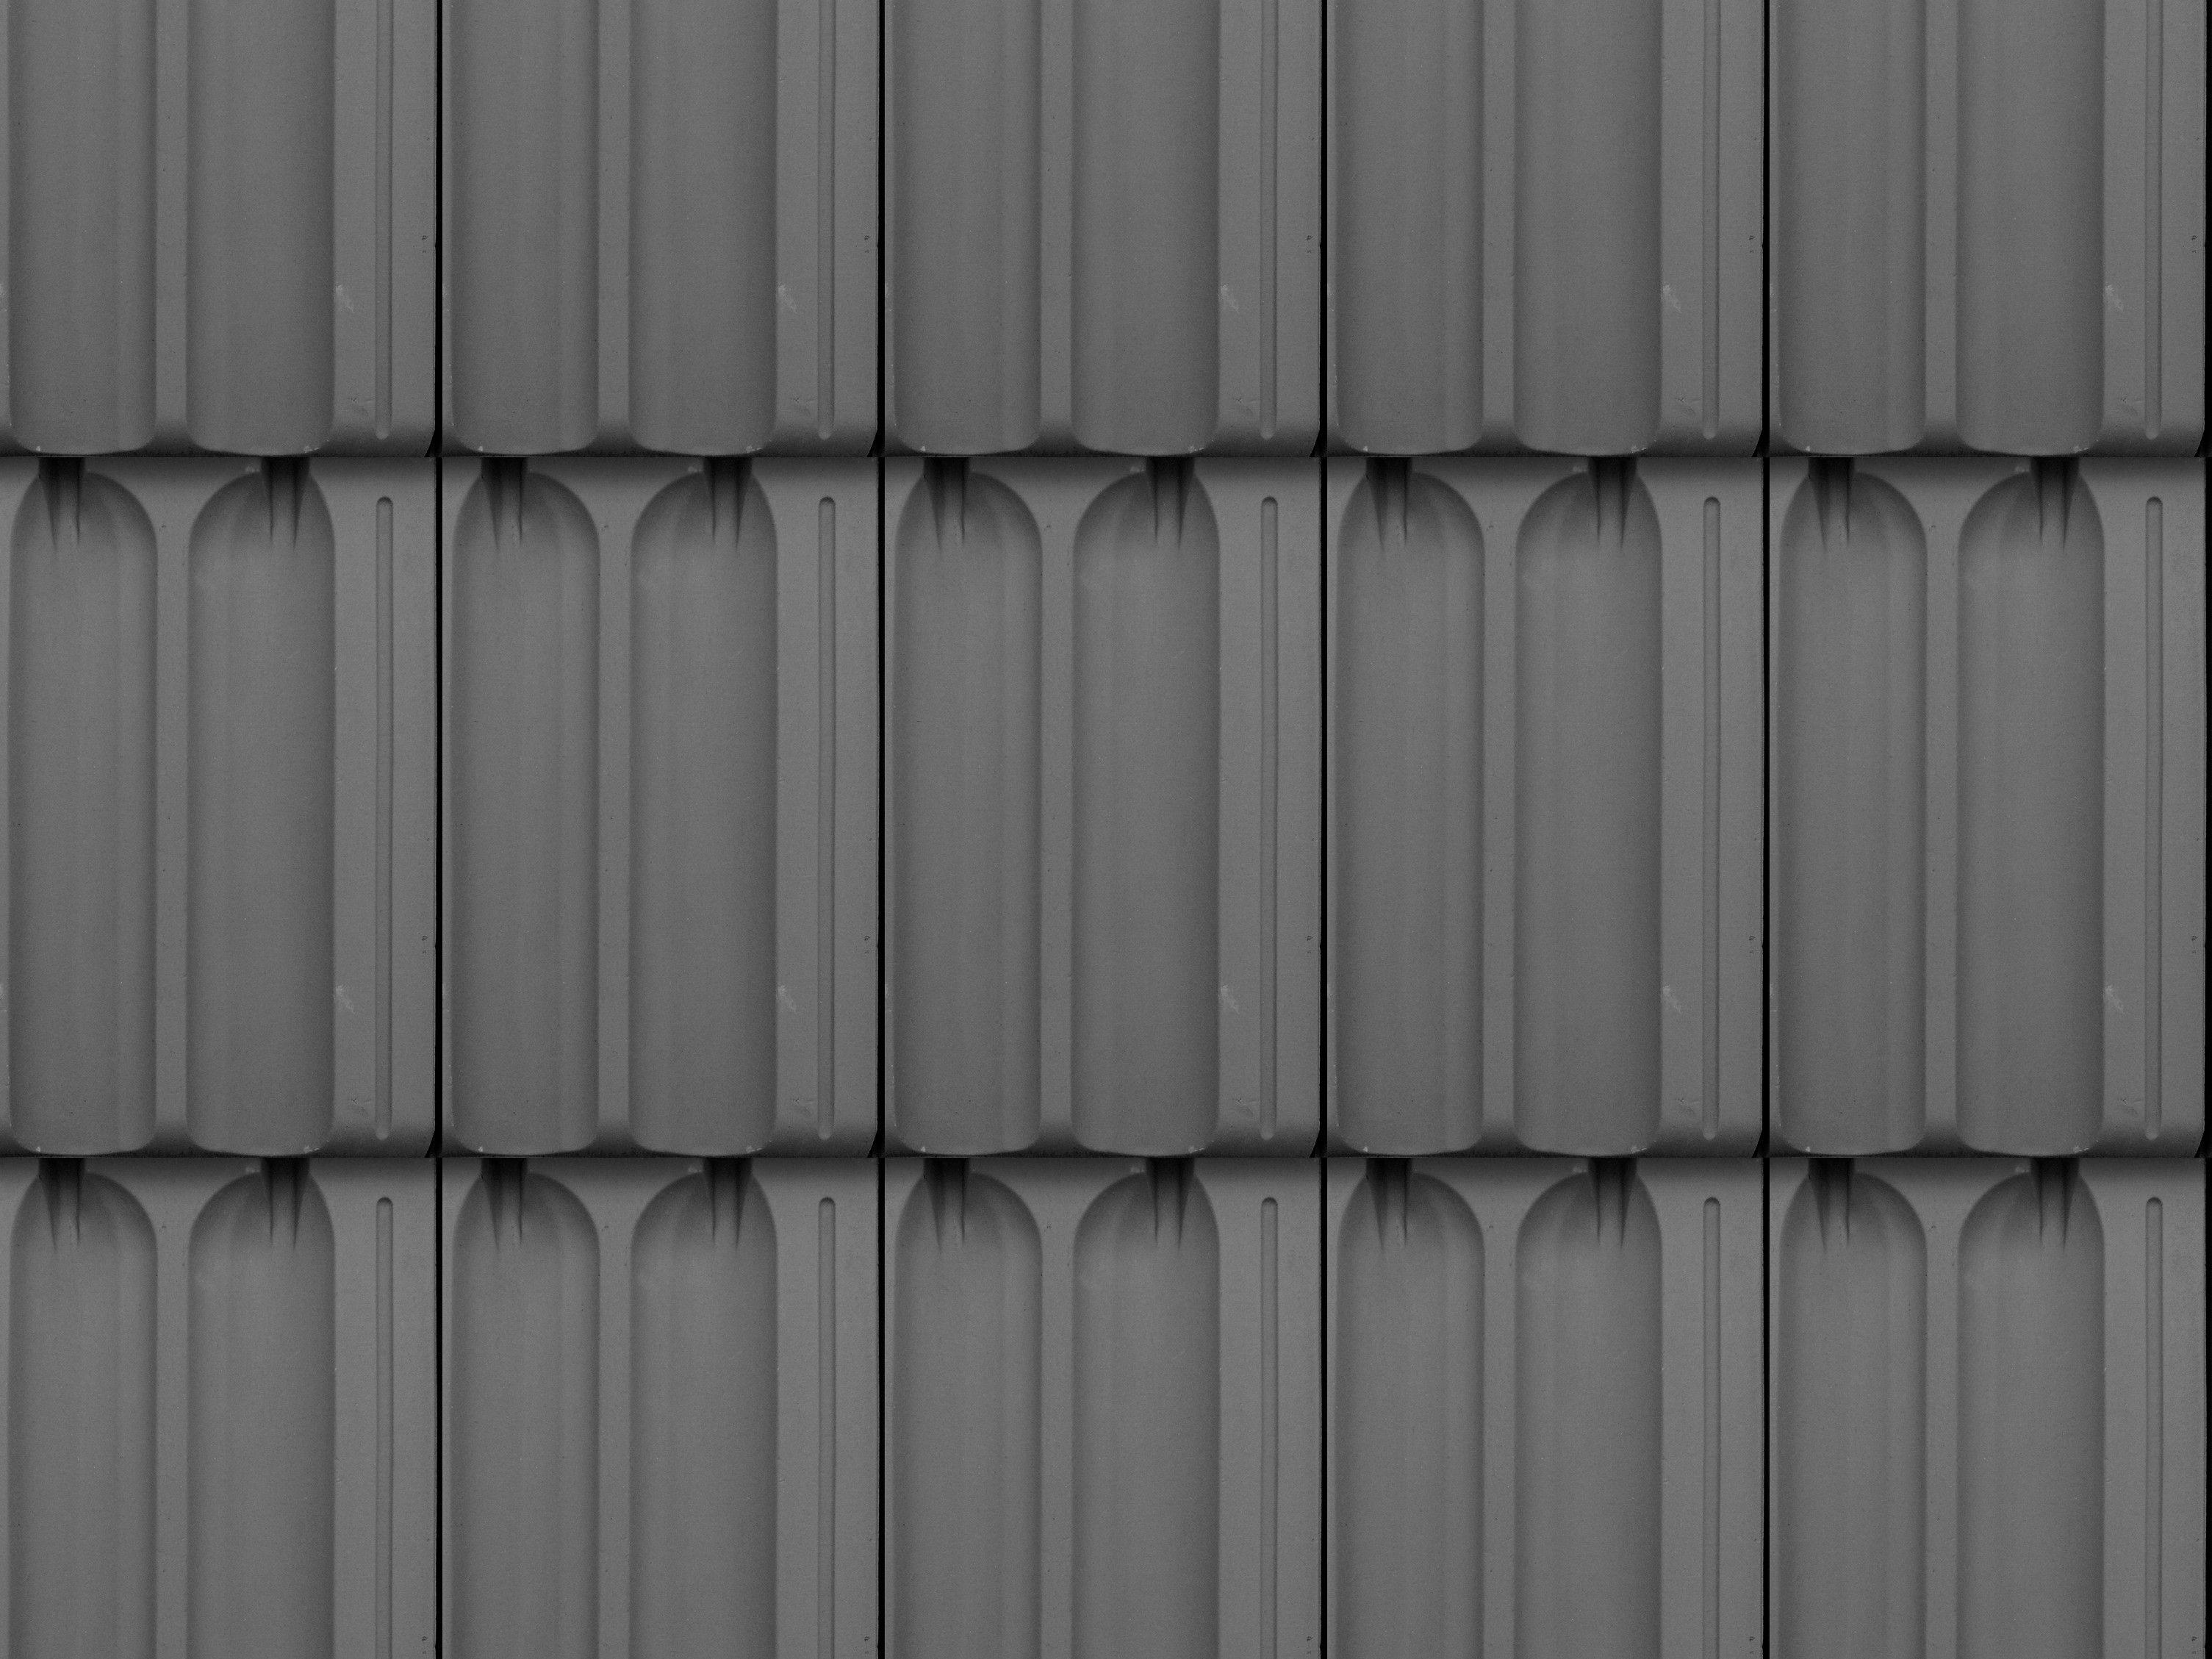 New Seamless Gray Roof Tilesdiscover Textures Dosemeler Cati Kiremit